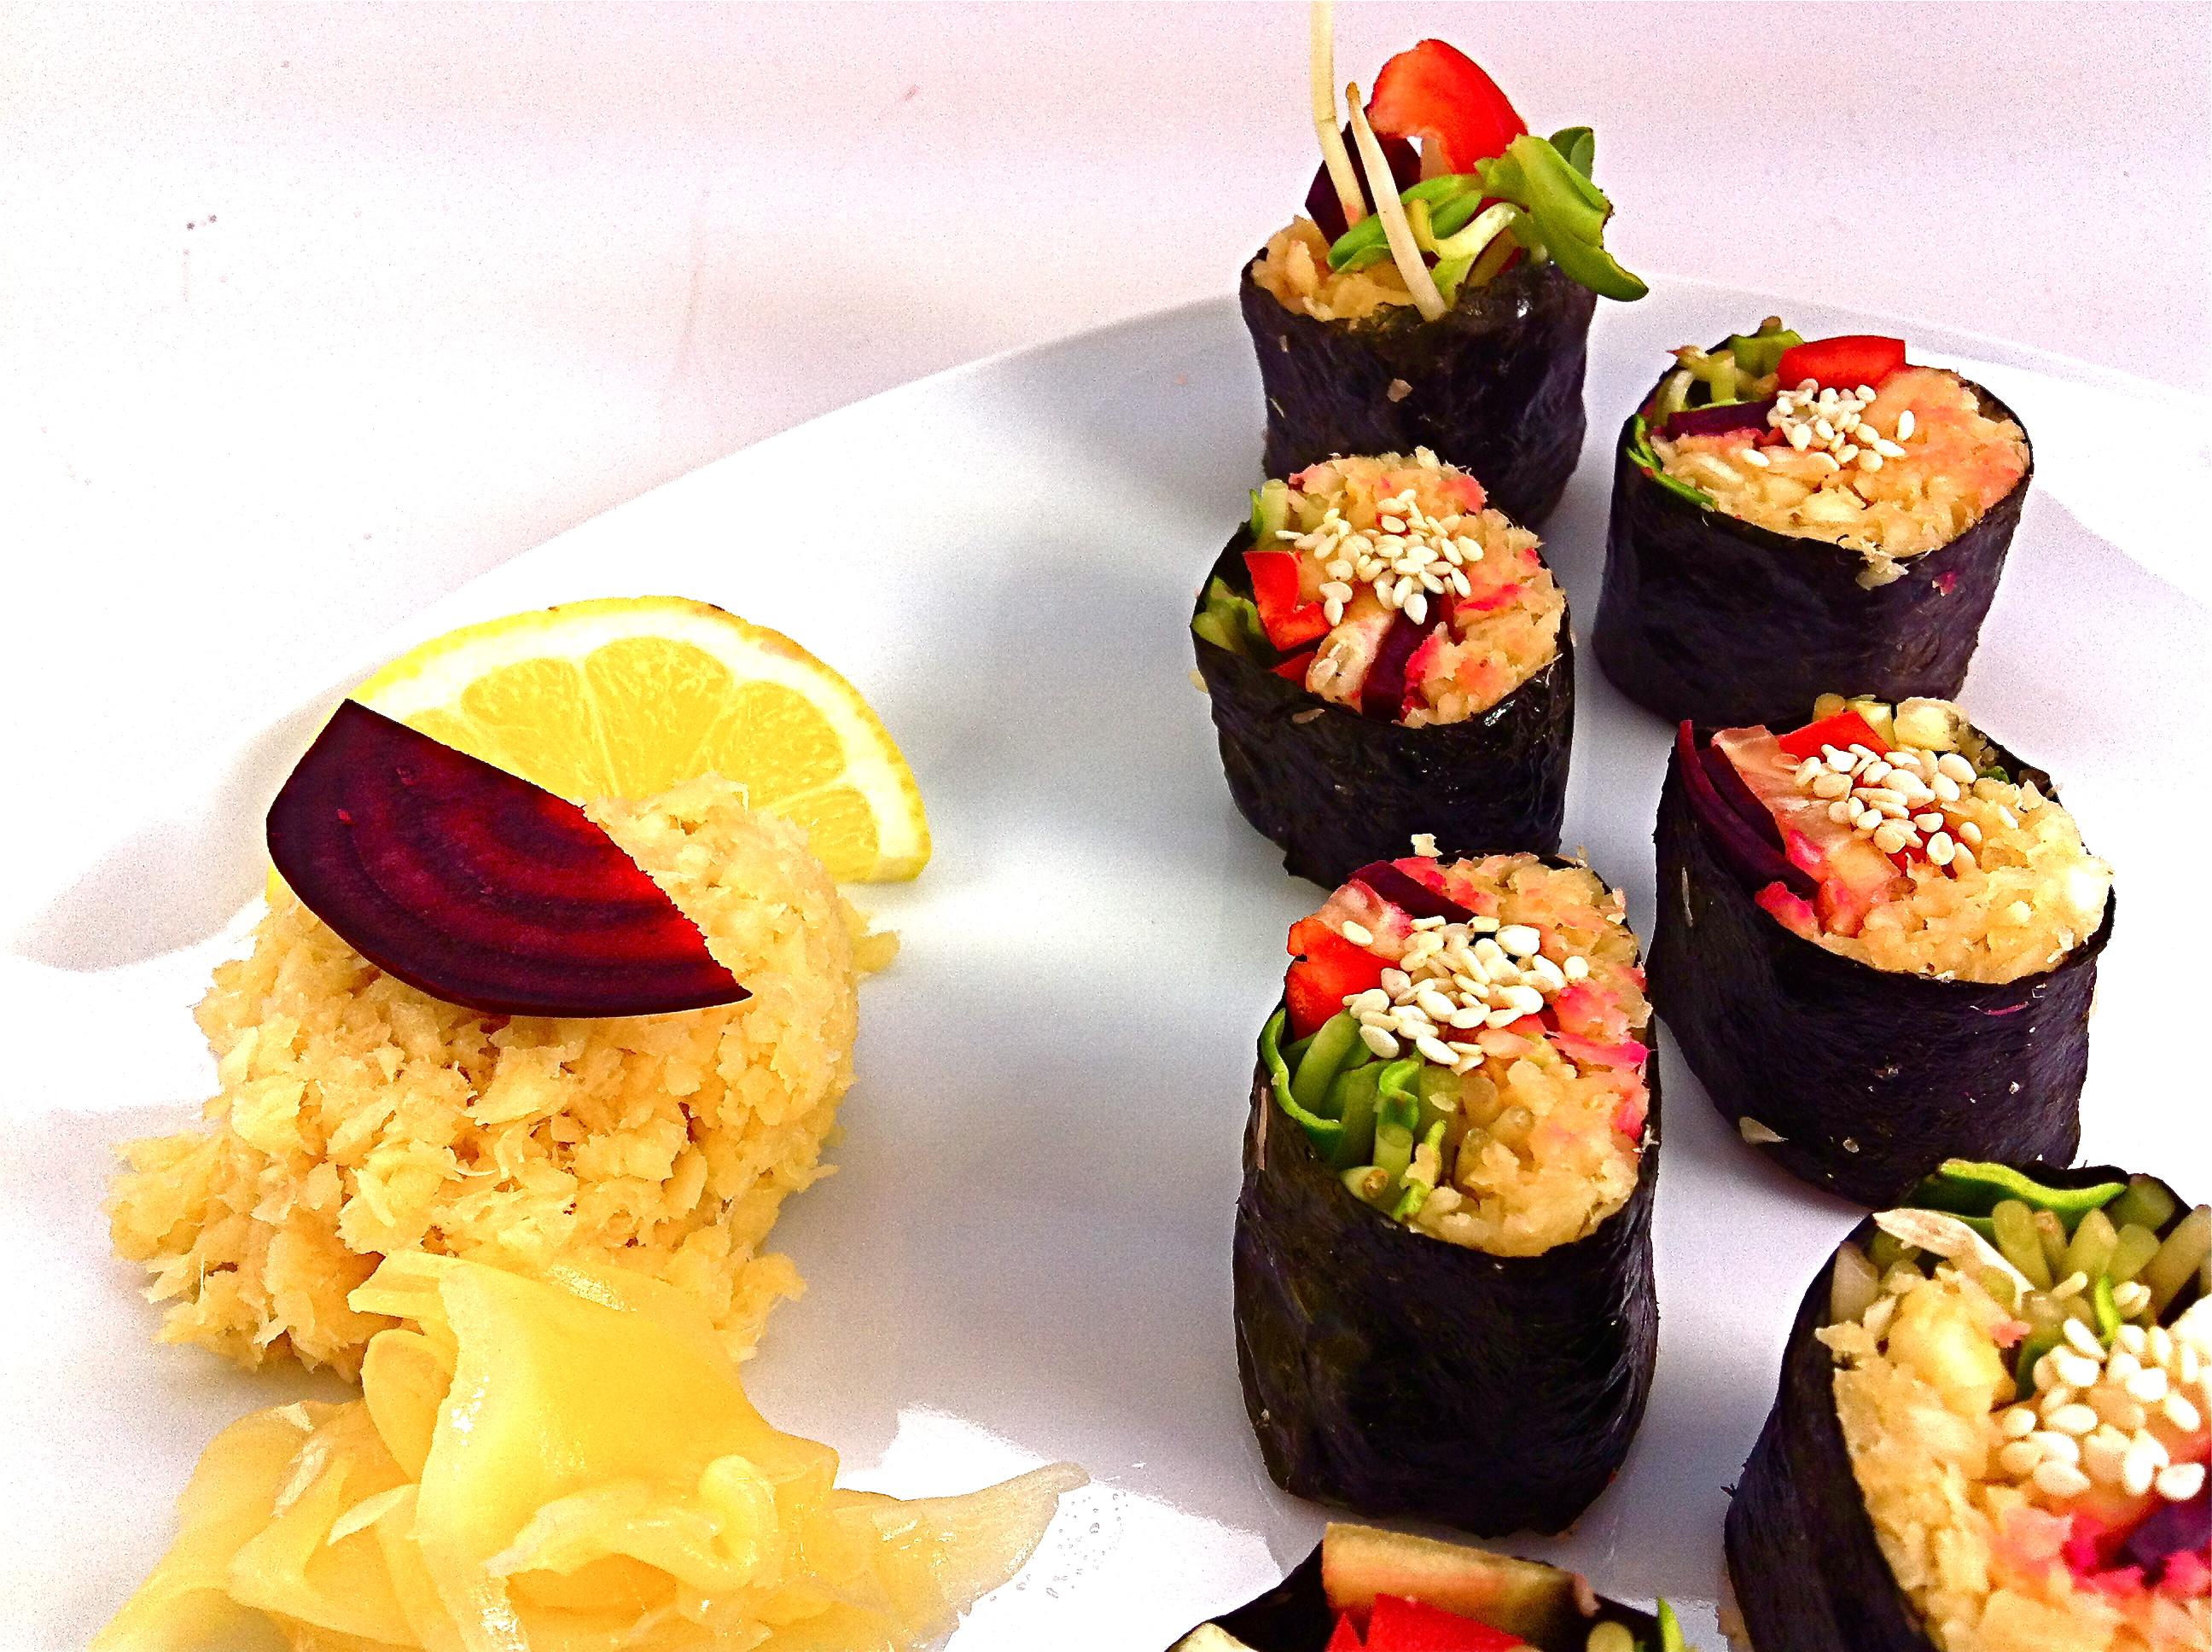 Raw Parsnip Sushi